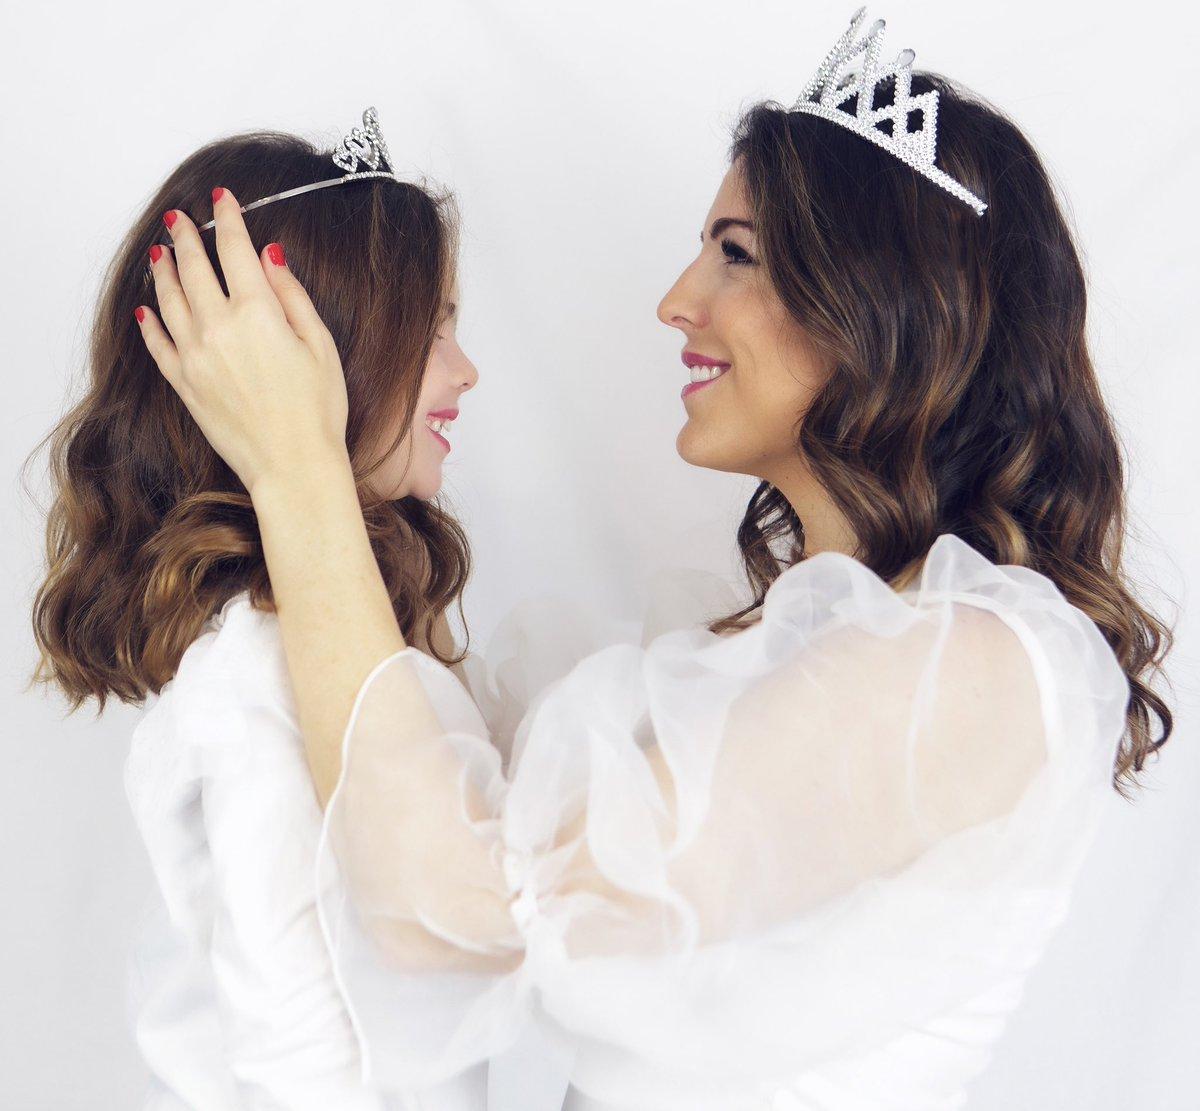 En instagram os cuento lo que me dijo Alexa hace unos días... tan intenso y bonito https://www.instagram.com/p/CCRRNDXoTxa/?igshid=a9k6pzawf8d1…  #love #truelove #amor #amordemadre #mommyandme #madreehija #motheranddaughter #likemotherlikedaughter #minime #miamor #mylove #mivida #princess #myprincess #alexapic.twitter.com/5VAuqjLZfA